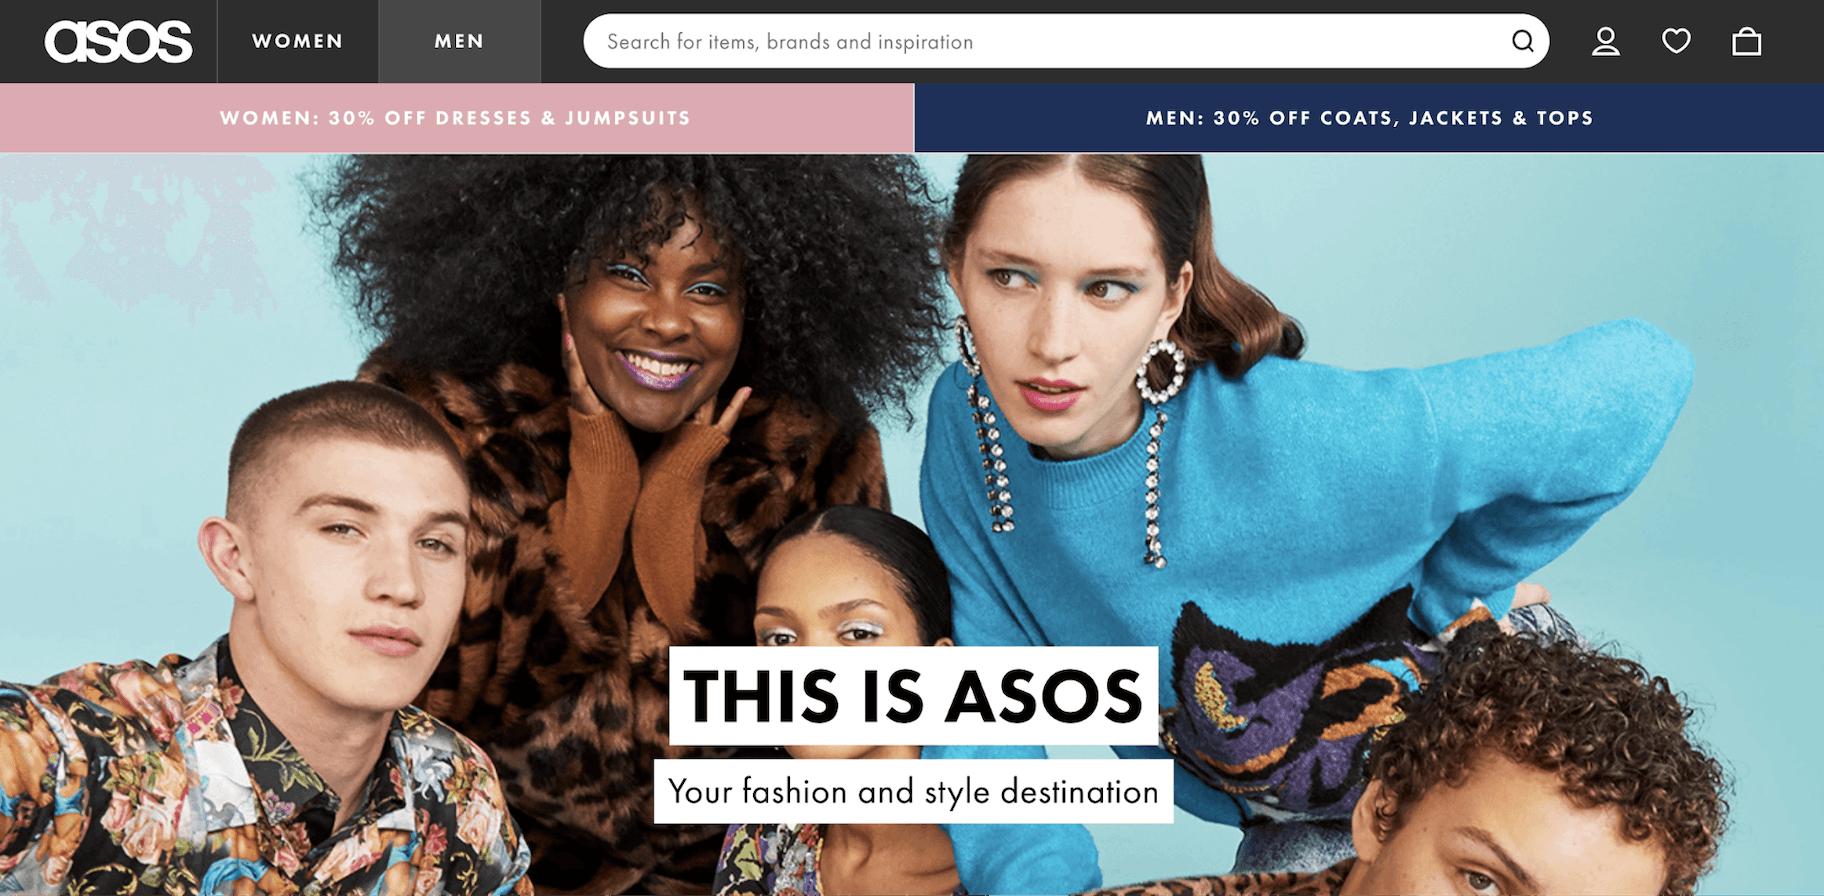 ASOS Vision statement